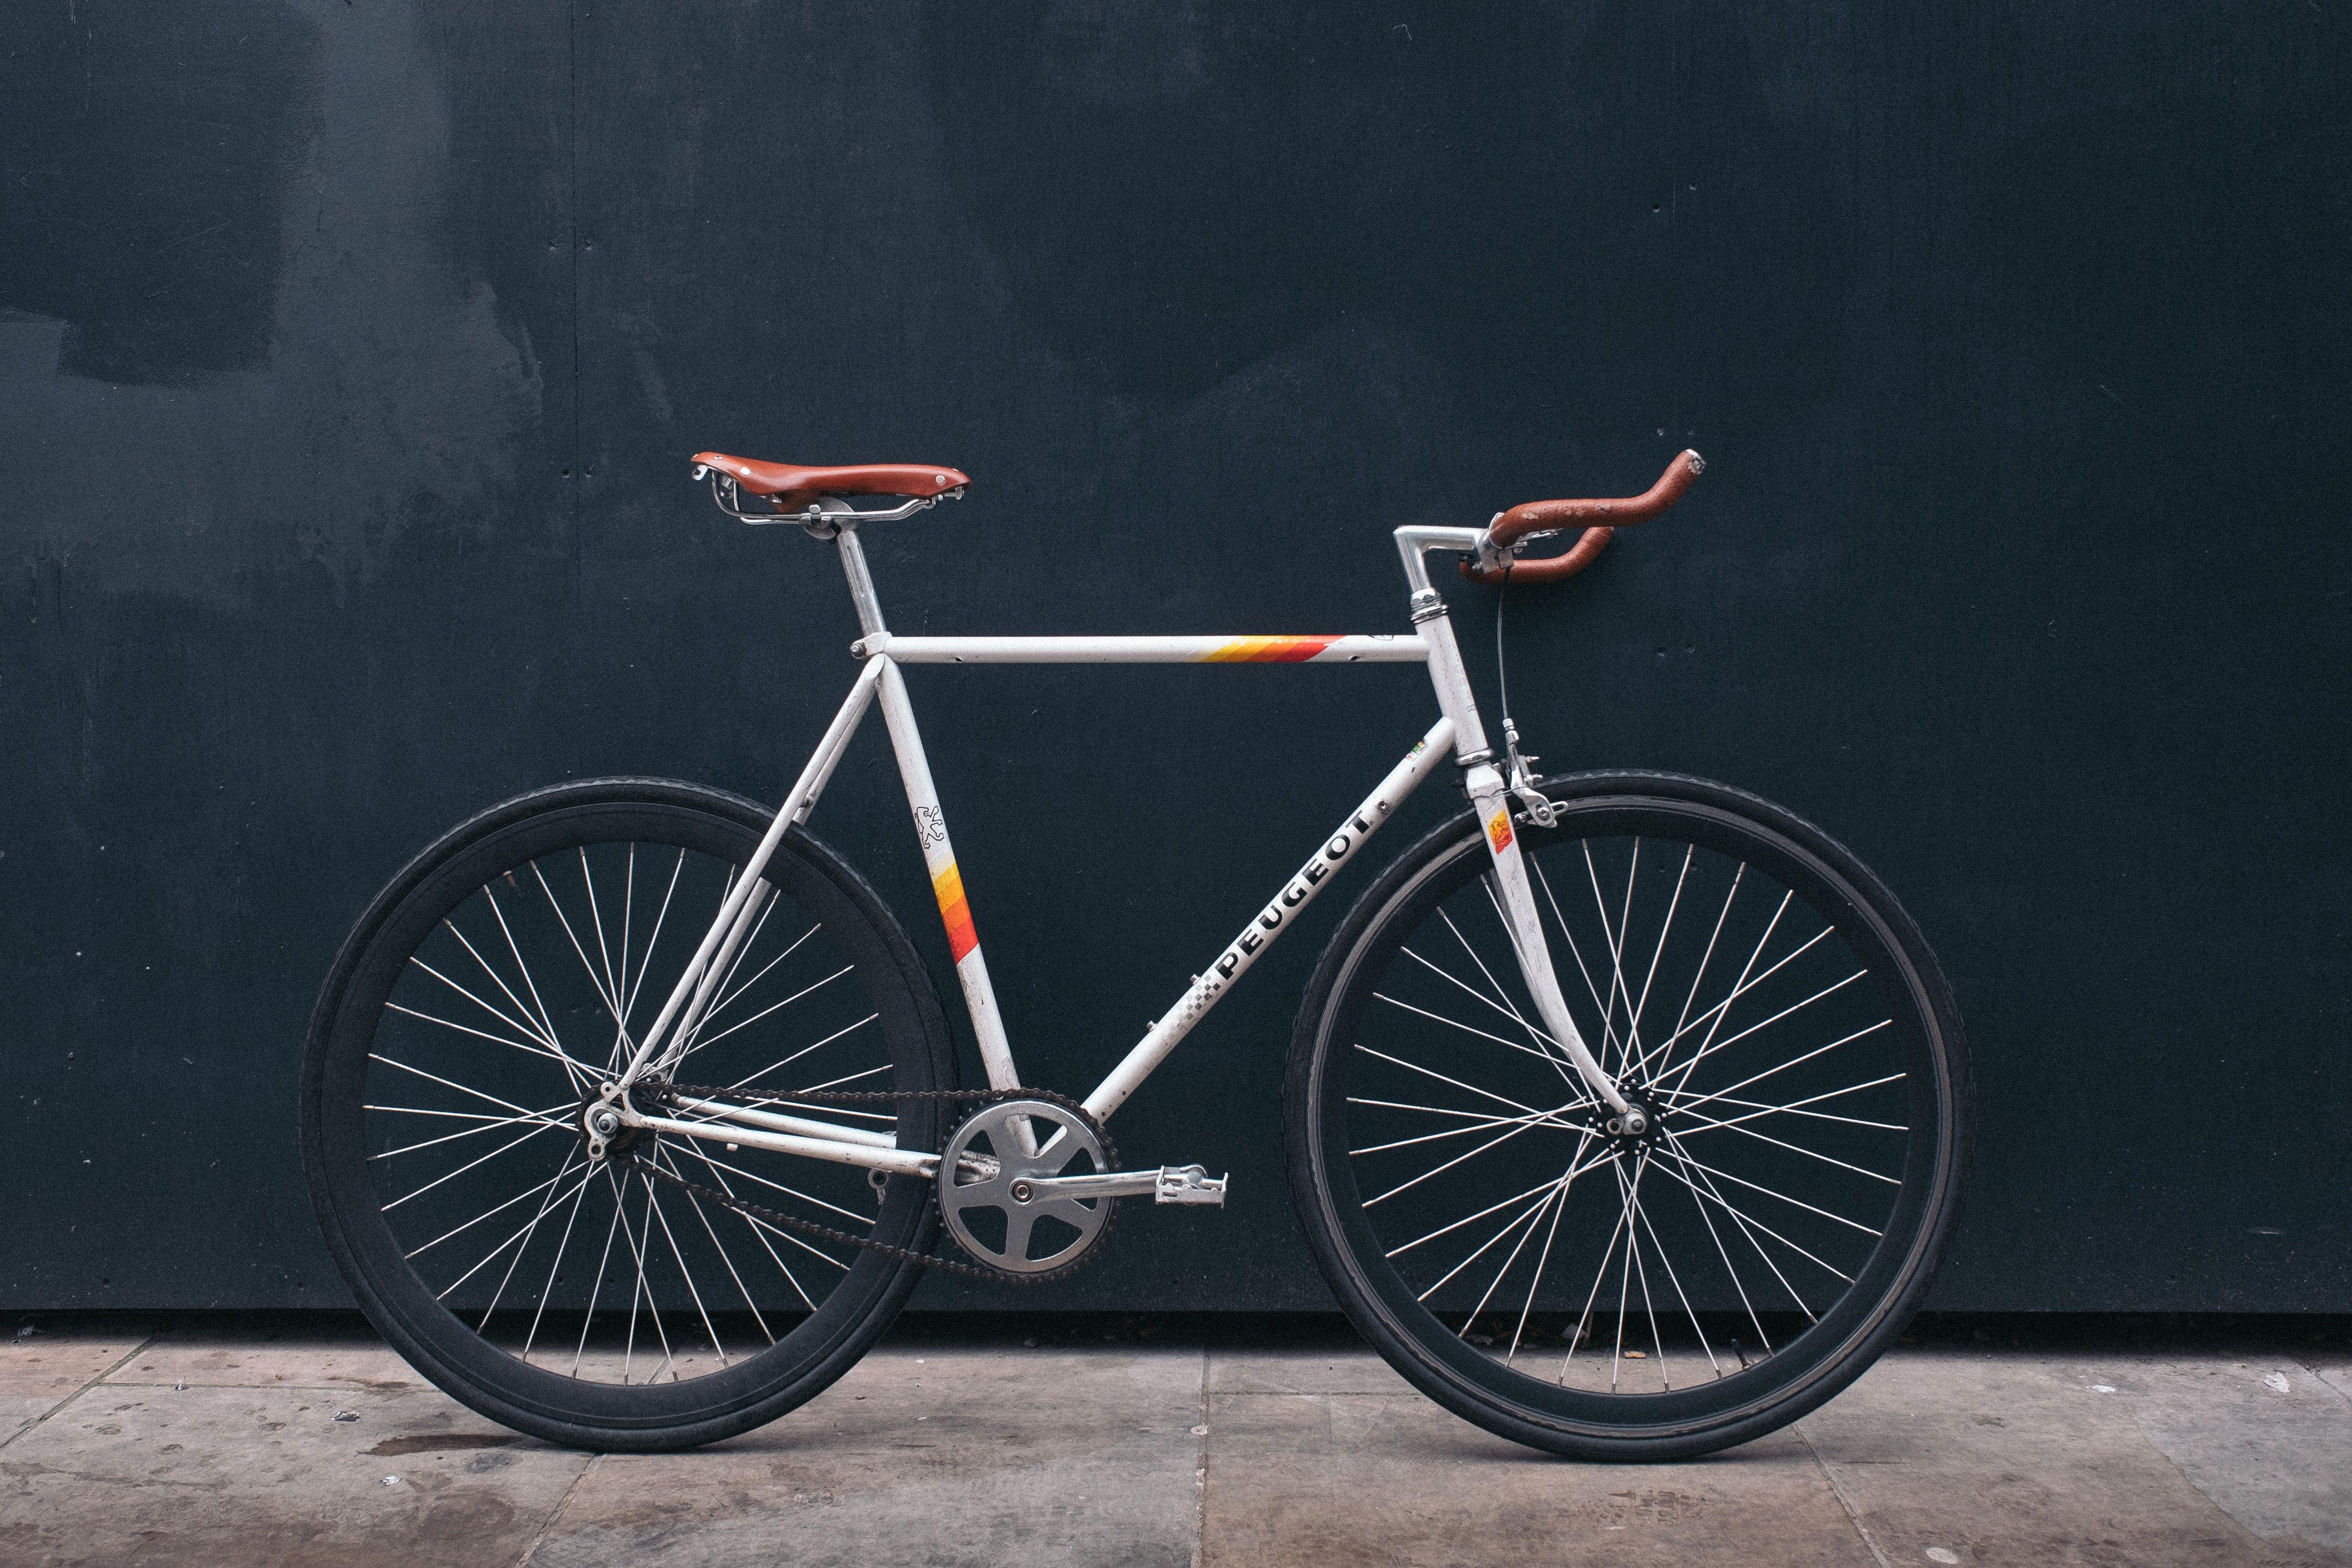 Peugeot retro bike